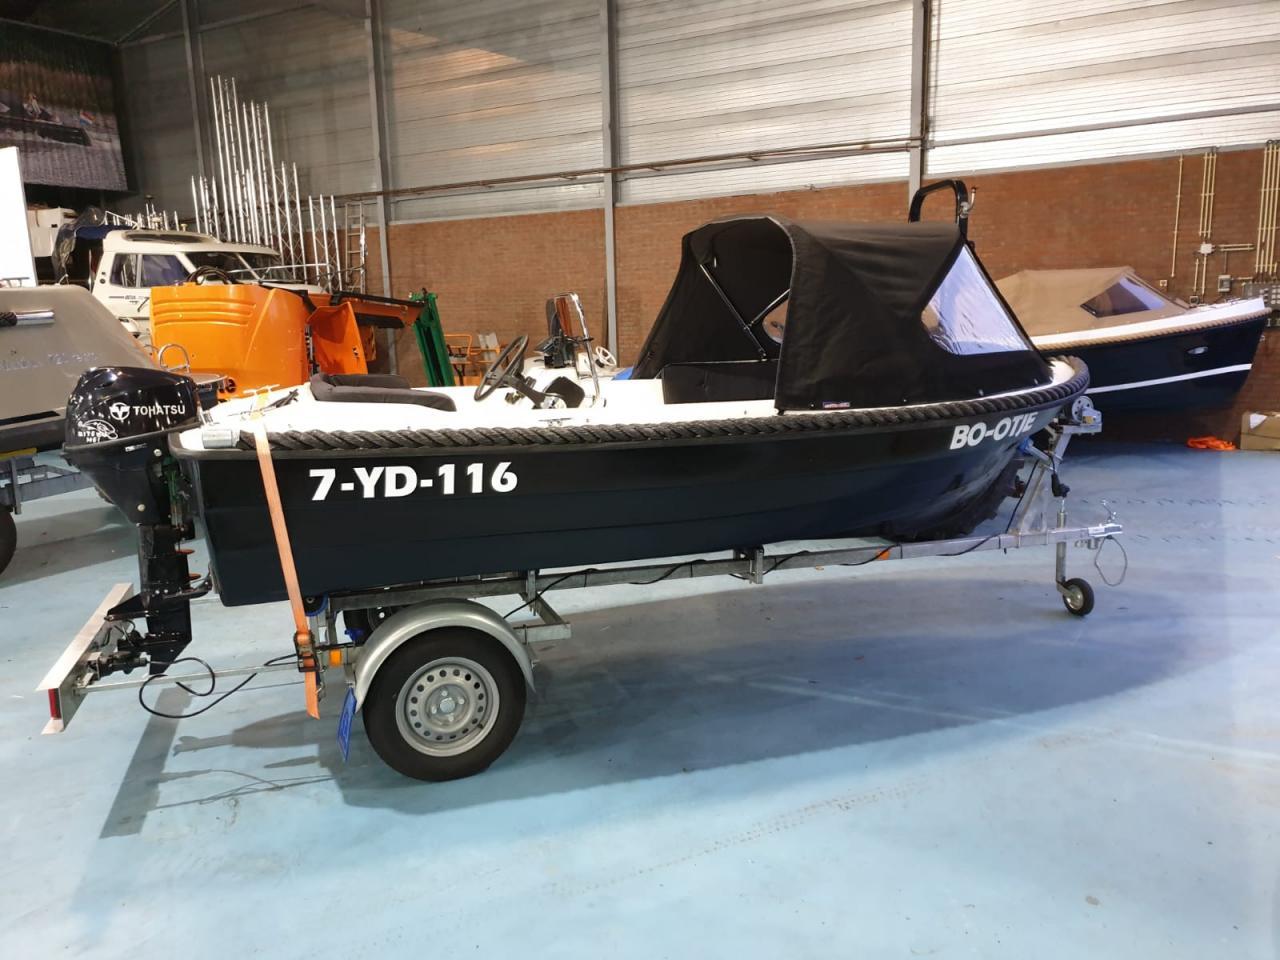 Seafinder 435 met Tohatsu 9.8 pk motor 7